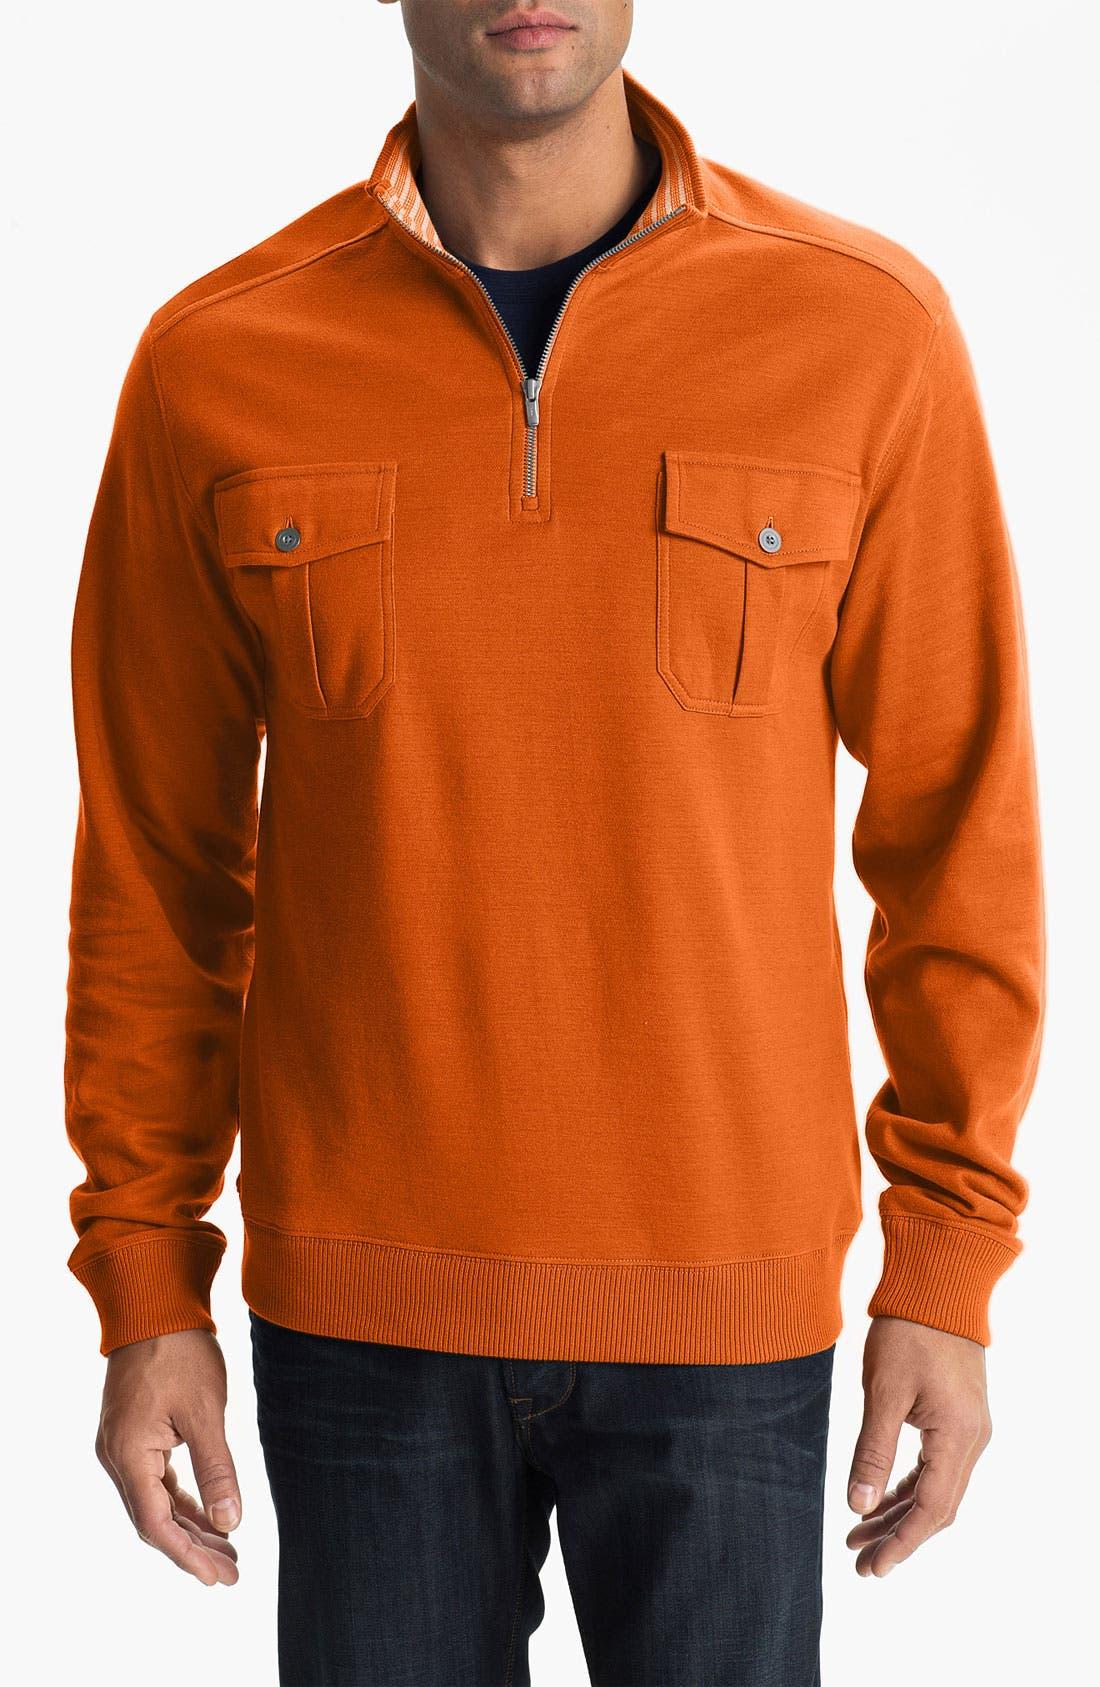 Main Image - Cutter & Buck 'Viewlands' Half Zip Pullover